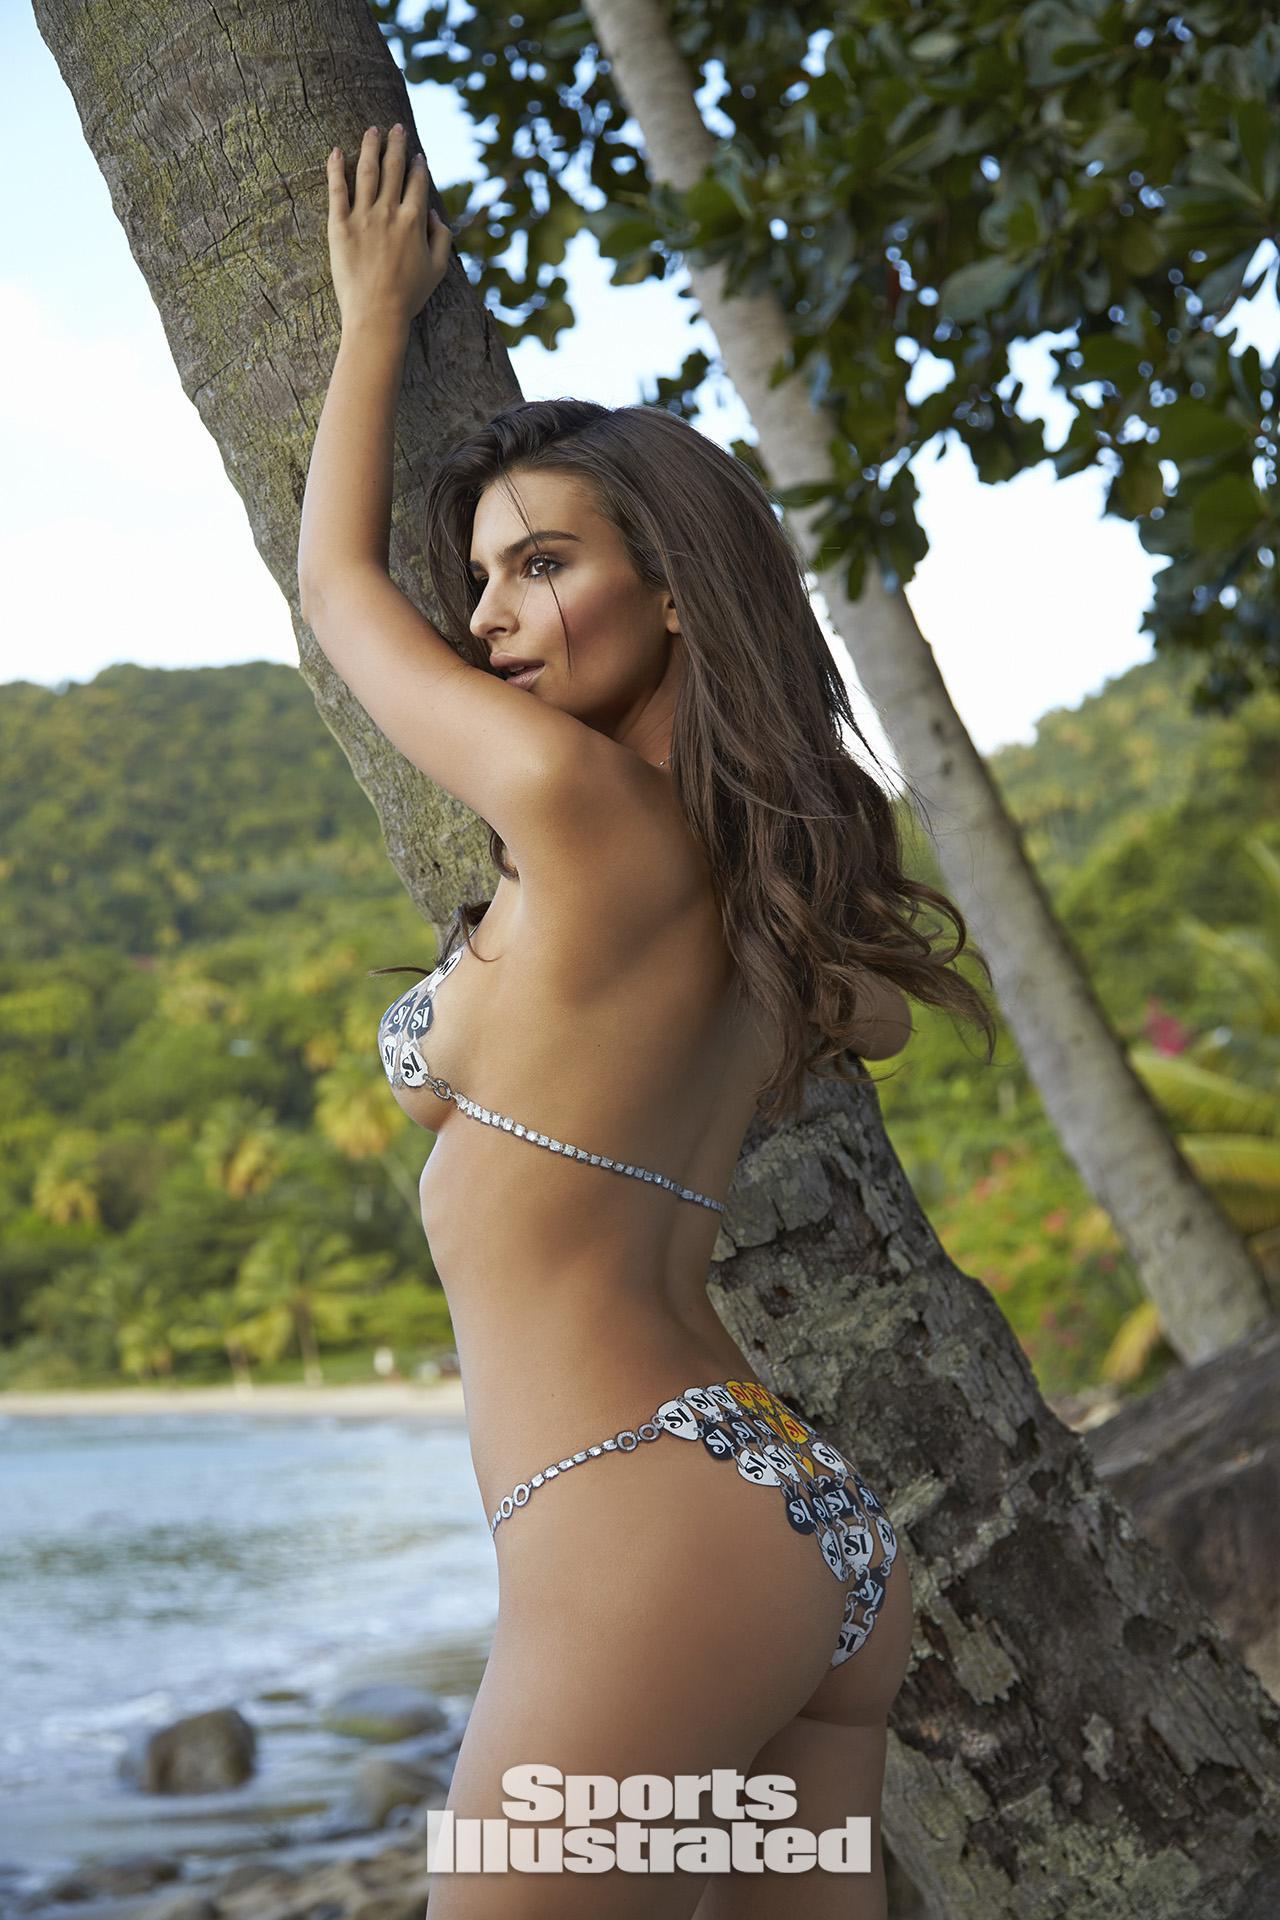 Lindsey Vonn Wiki >> Emily Ratajkowski Swimsuit Body Paint Photos, Sports Illustrated Swimsuit 2014